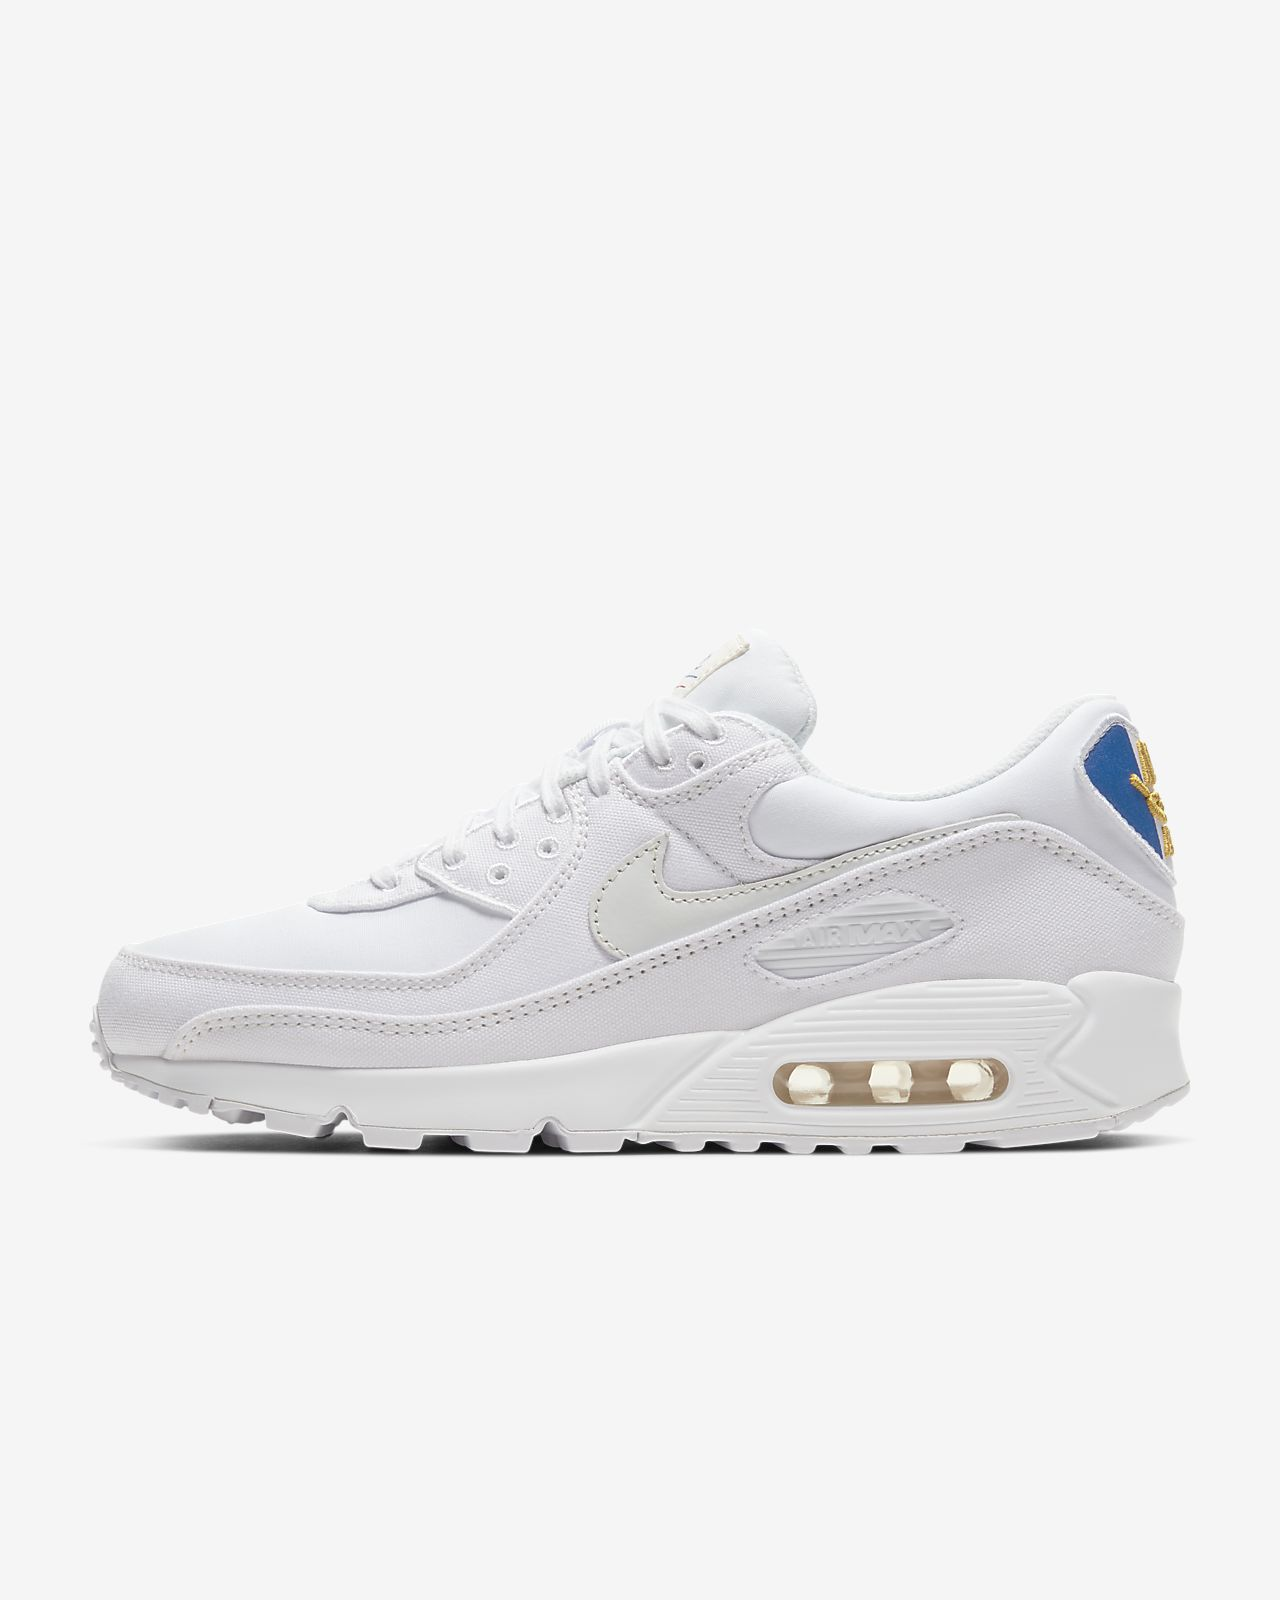 Nike Air Max 90 Premium Schuh